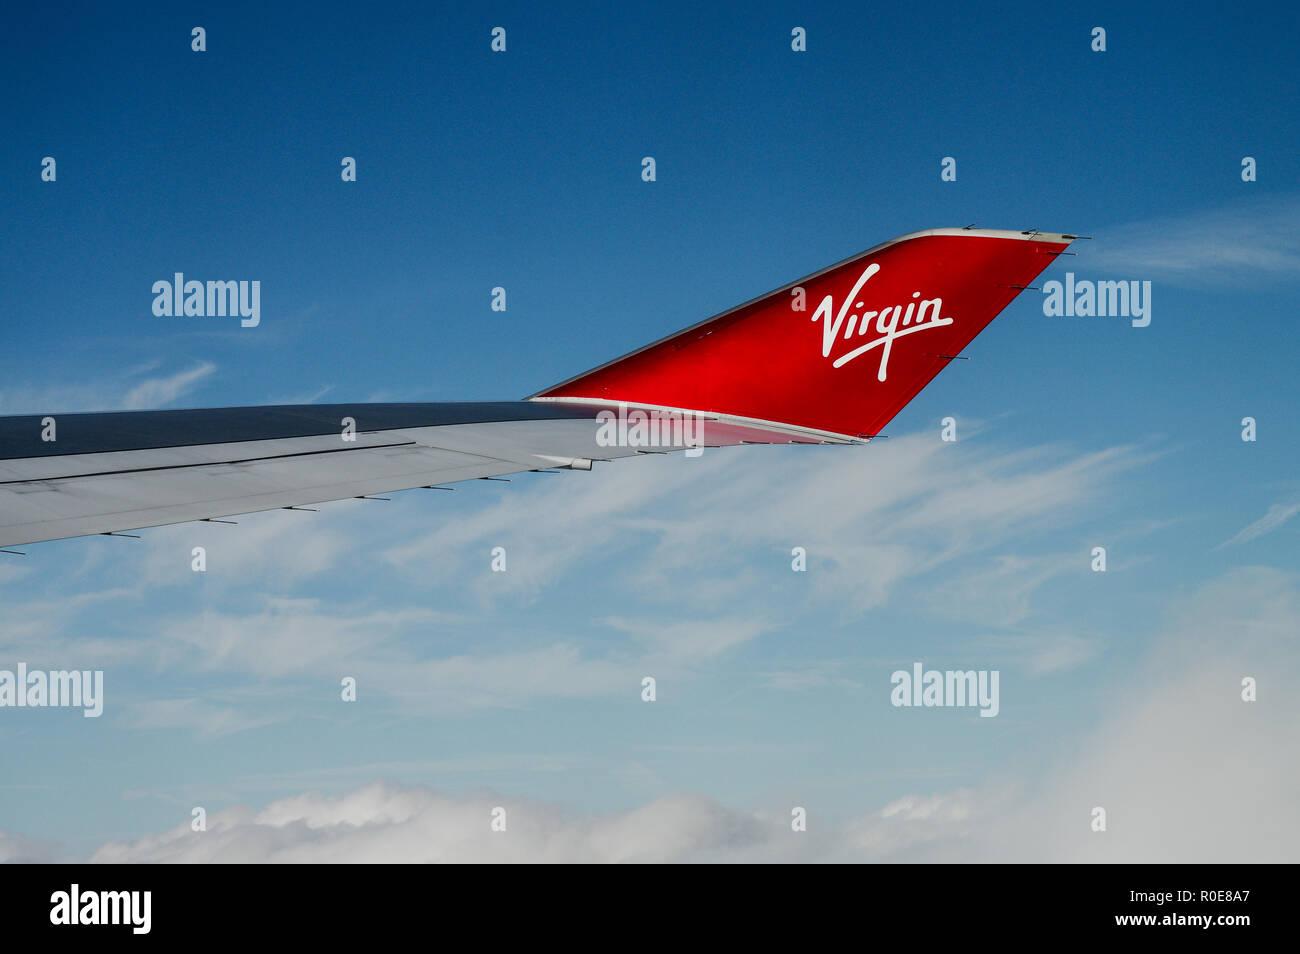 Distinctive winglet of a Virgin Atlantic Boeing 747 aircraft inflight - Stock Image